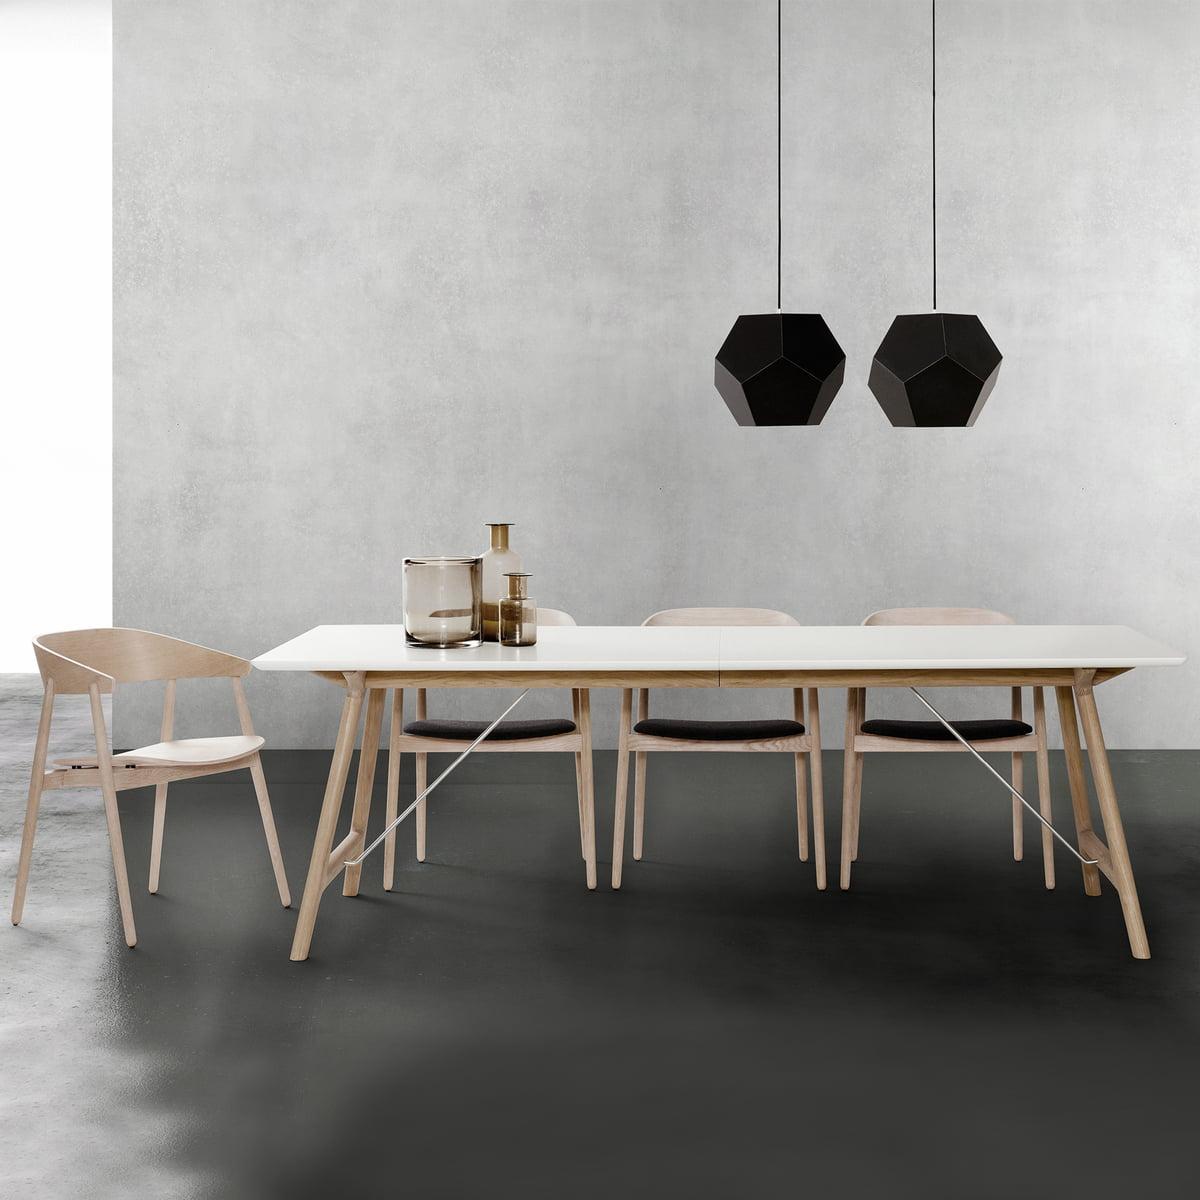 Savonné Andersen Furniture Blanc T7 Table 220 Stratifié CmChêne Extensible GMzVSUpq